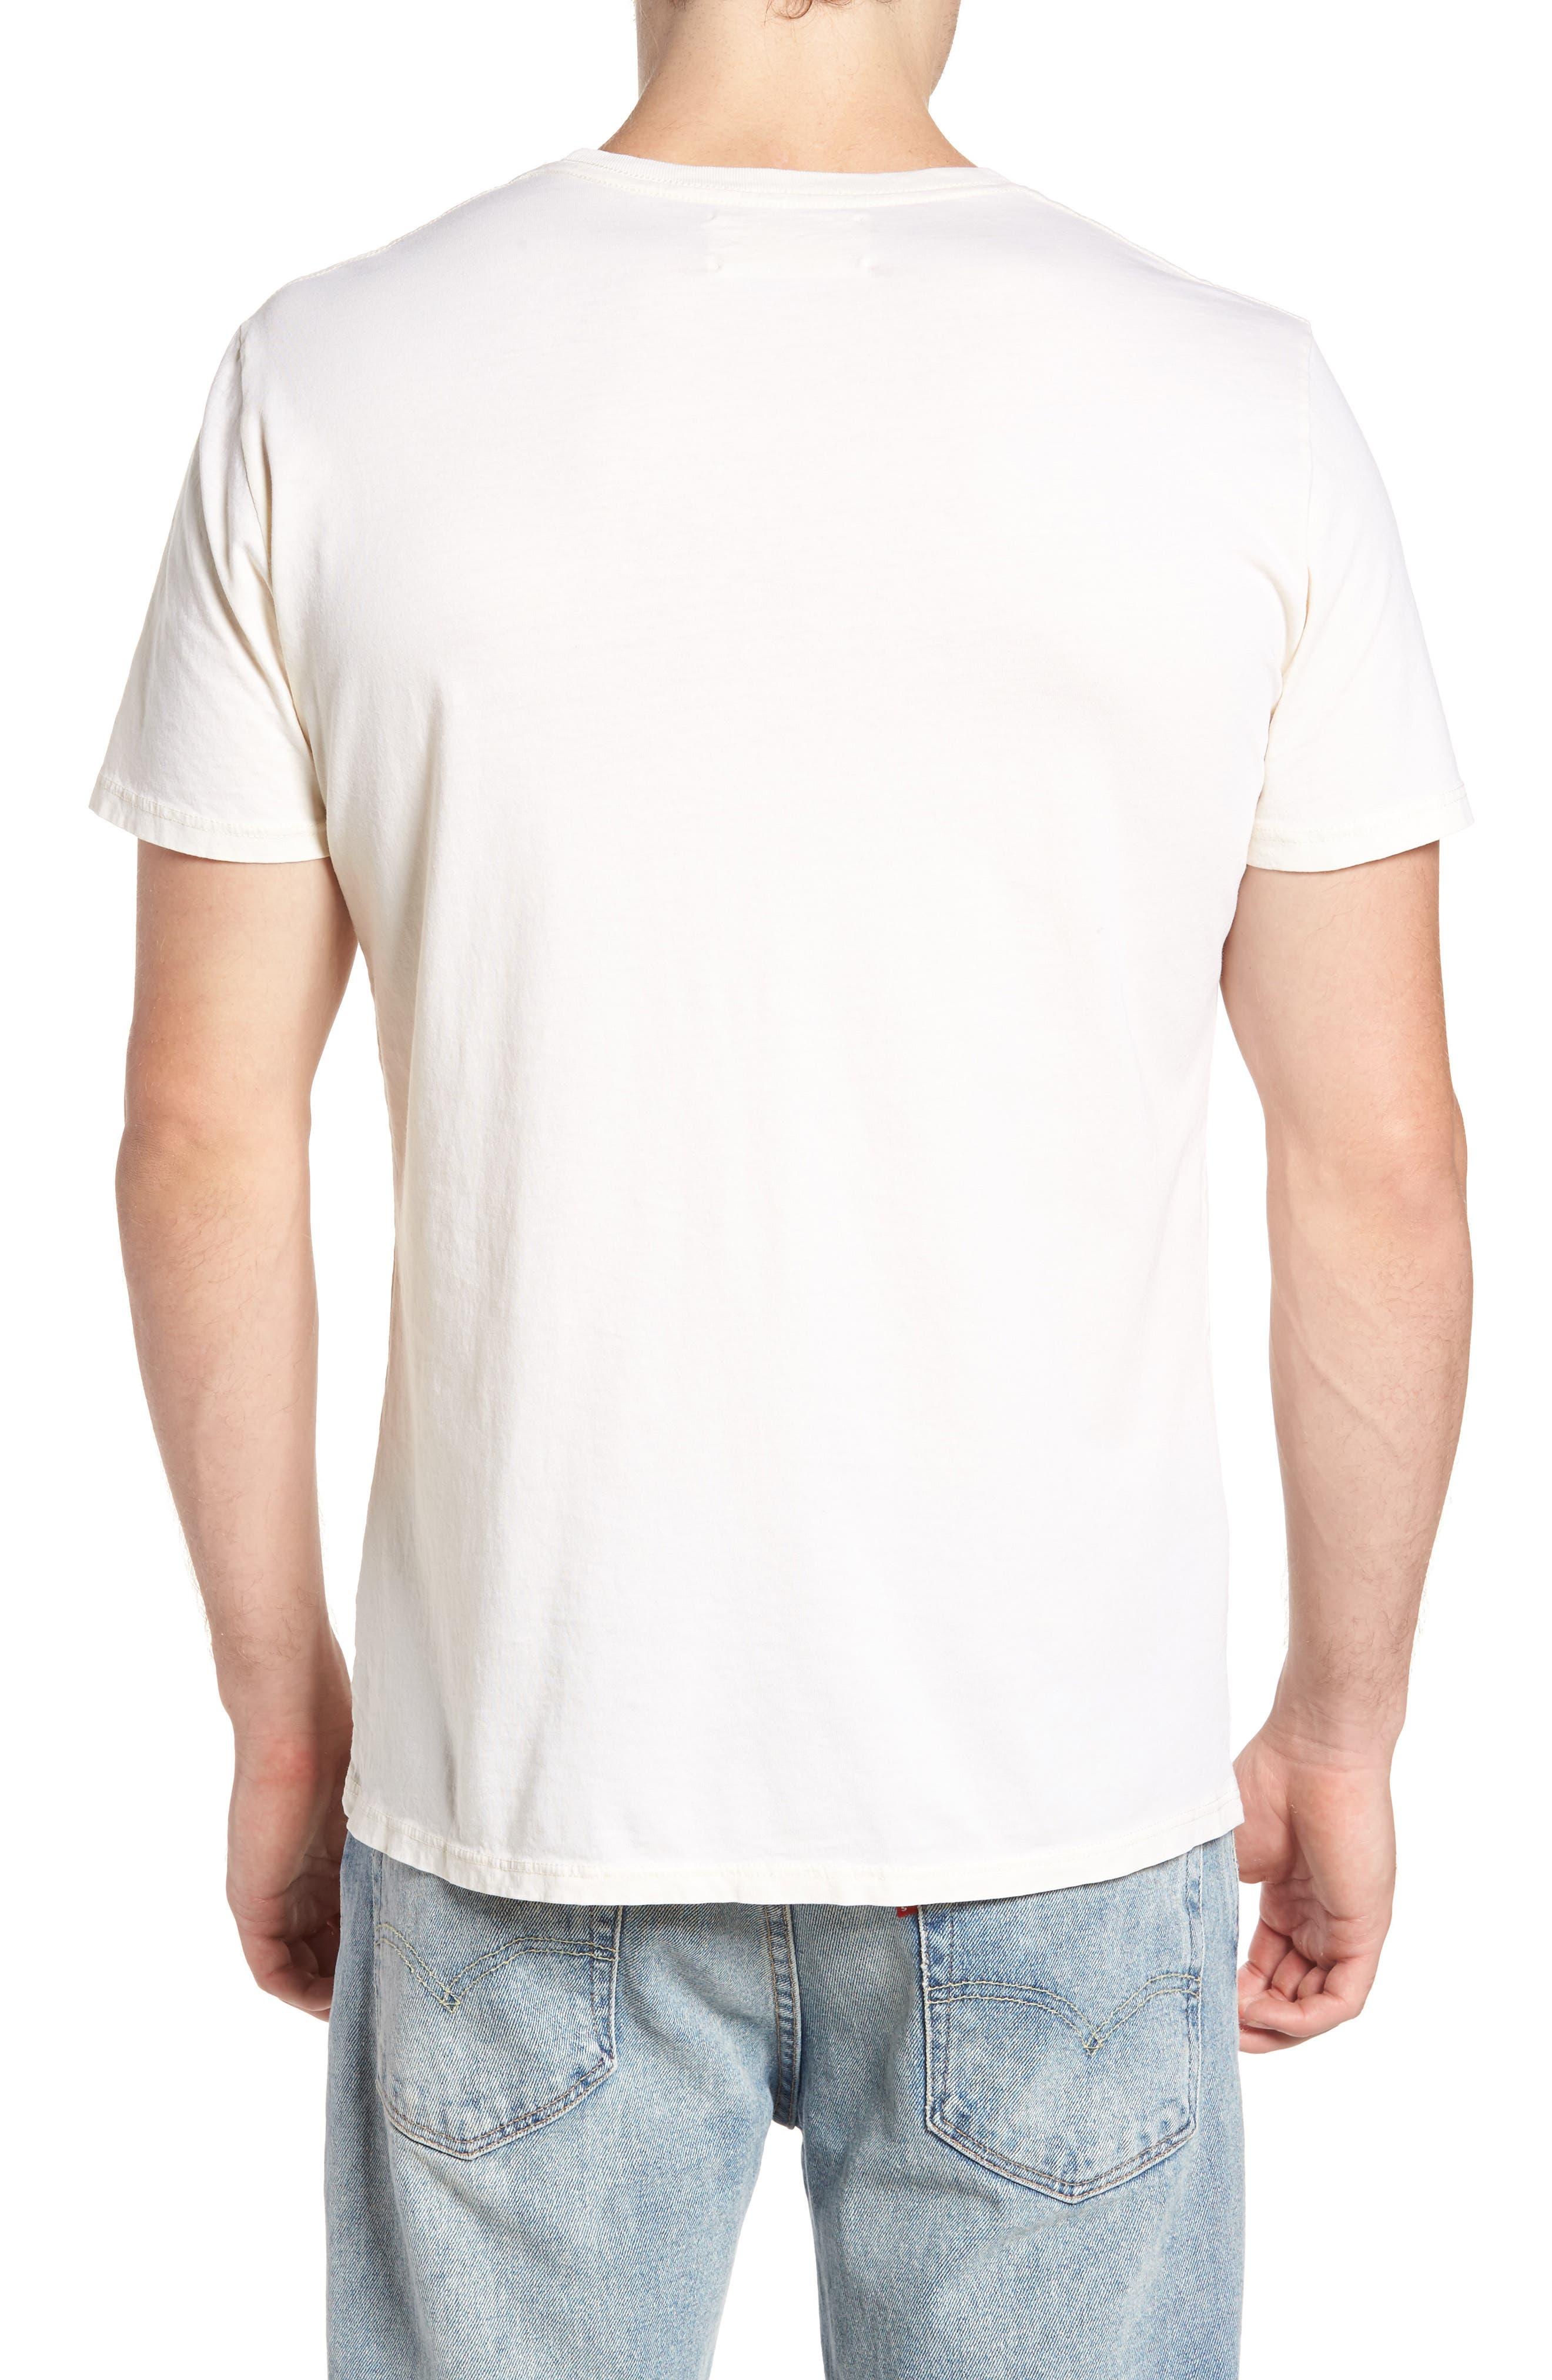 Pineapple Graphic T-Shirt,                             Alternate thumbnail 2, color,                             250